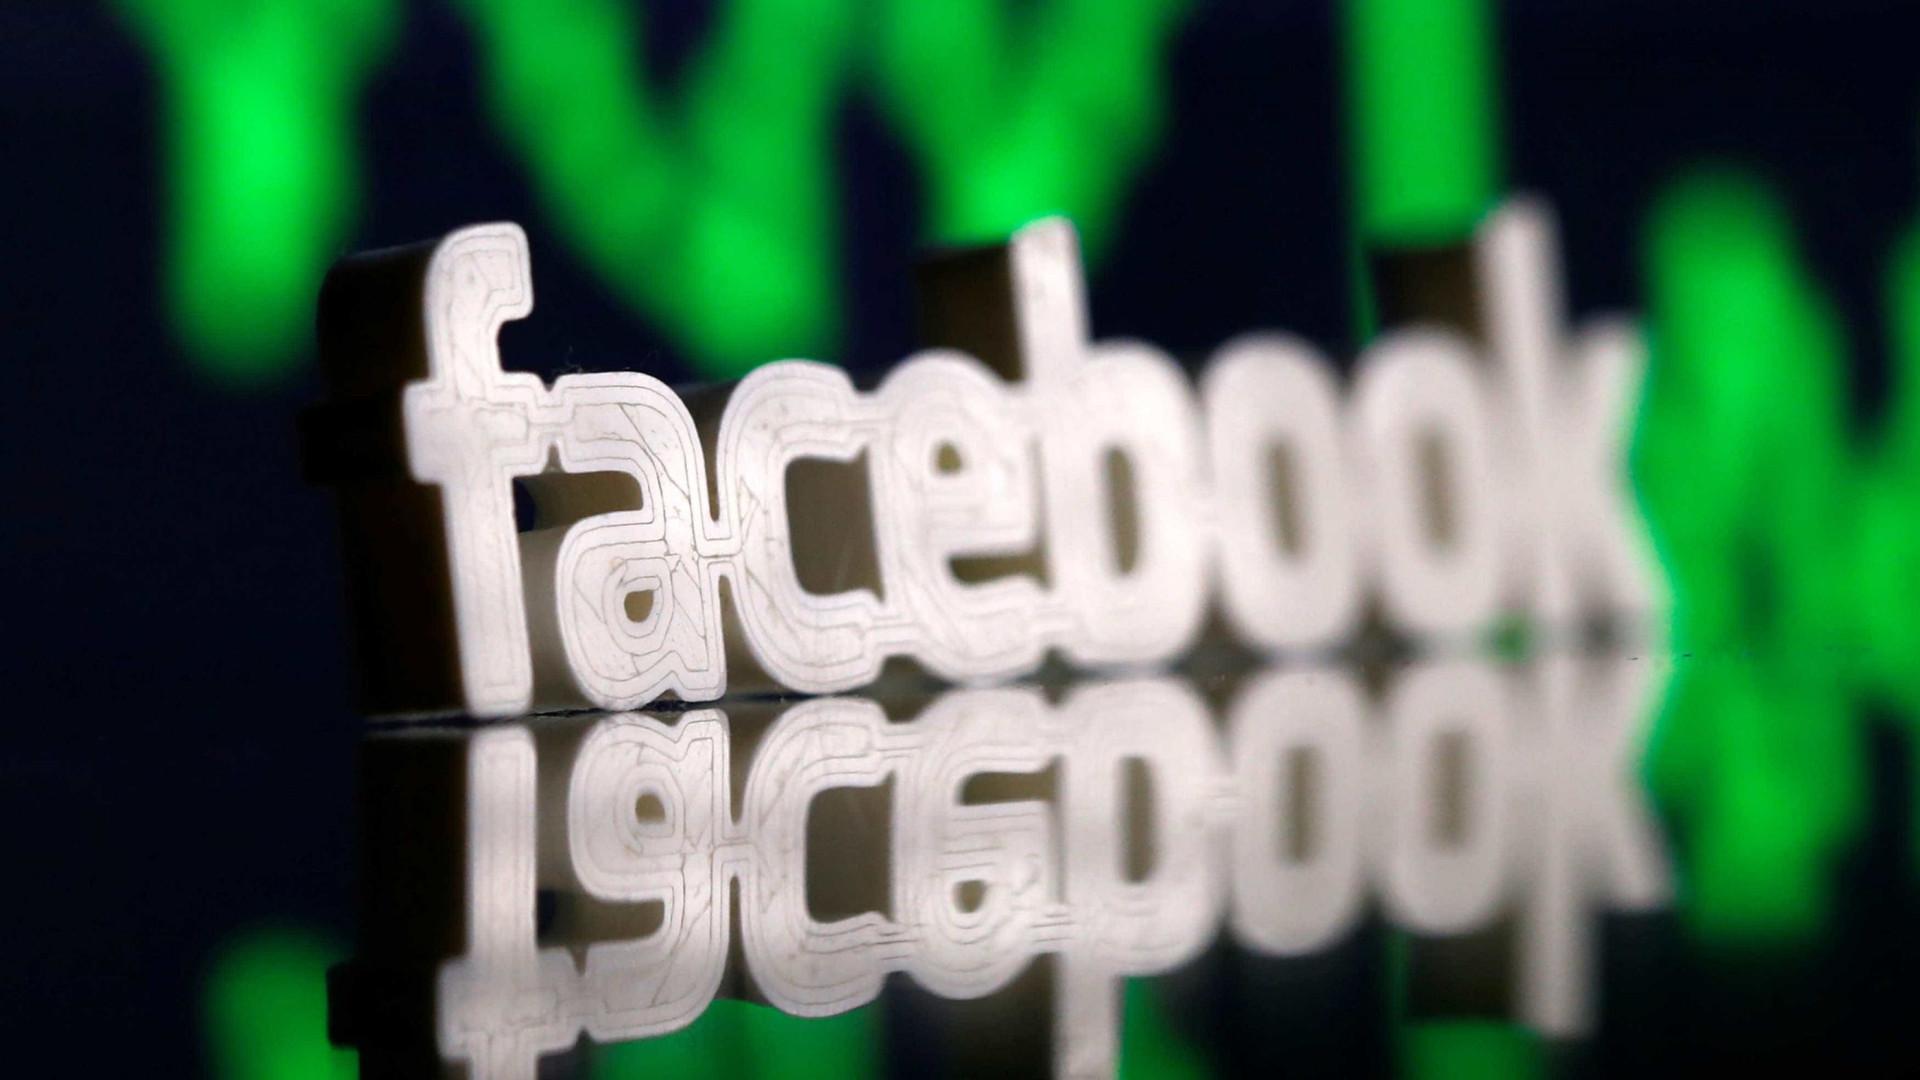 Facebook revela como evitará polémica semelhante à da Cambridge Analytica